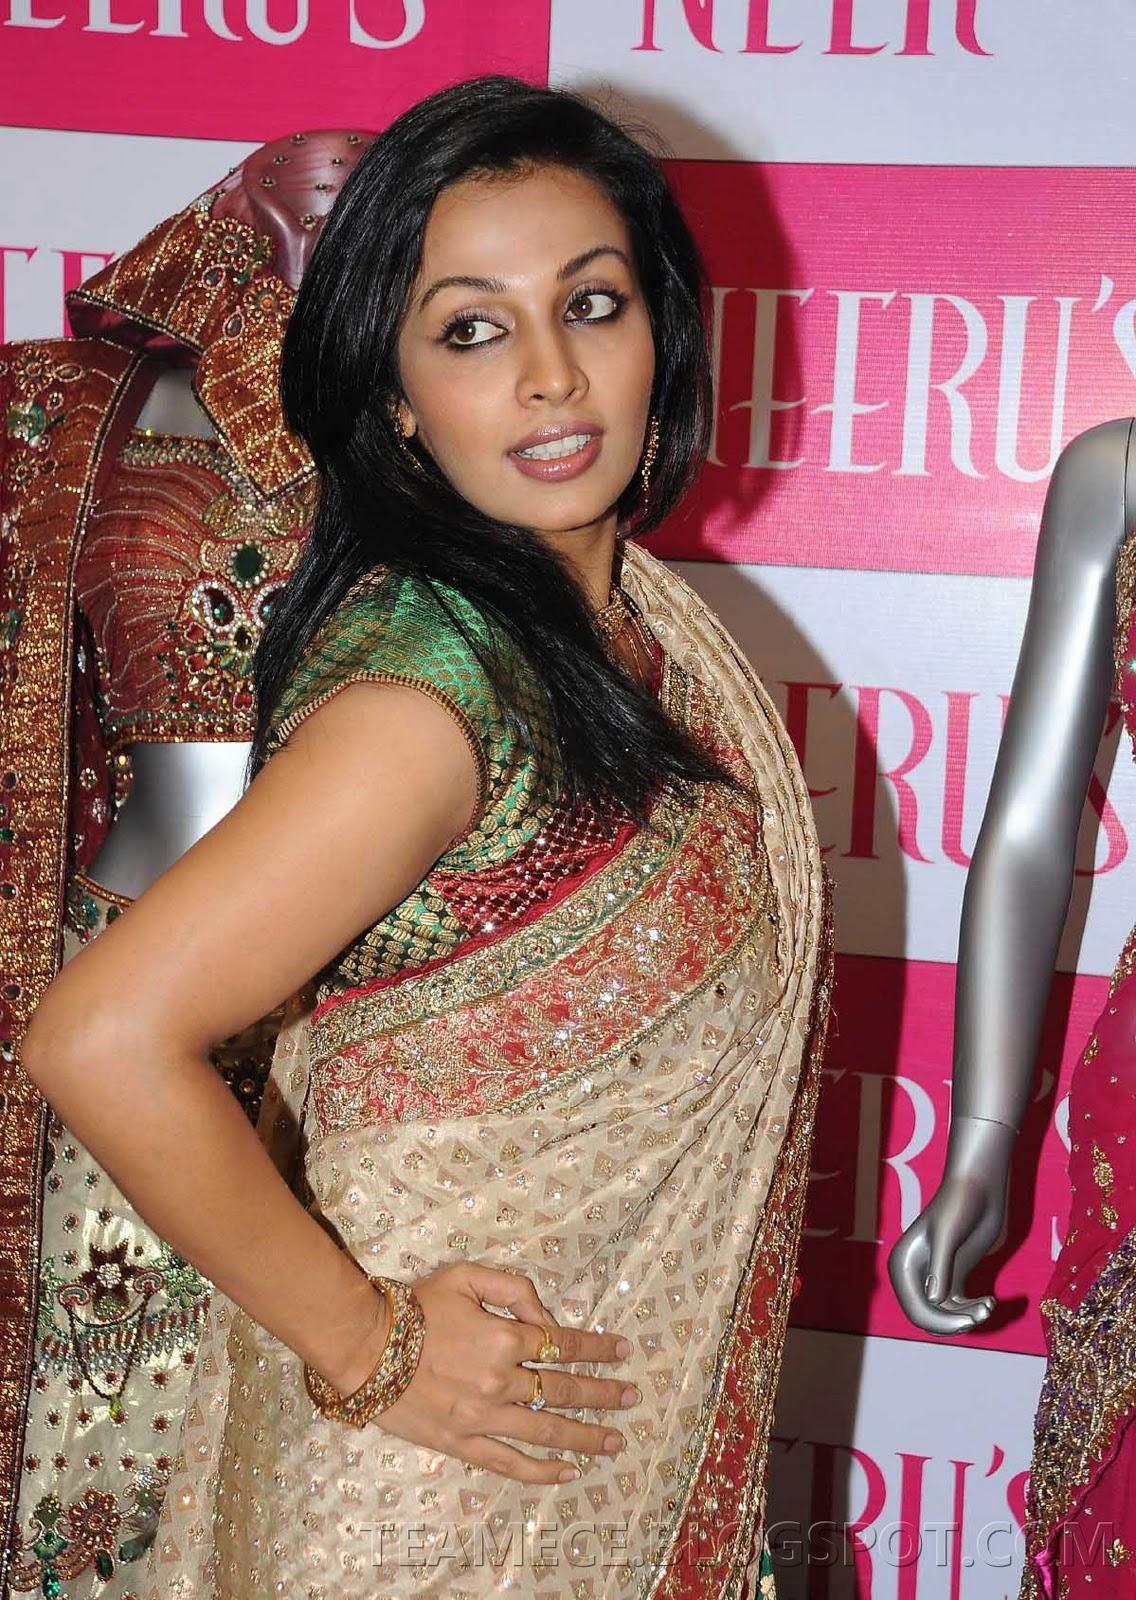 Telugu Xxx Bommalu Billeder Asha Saini Ny Hot Fast Photoall-3441